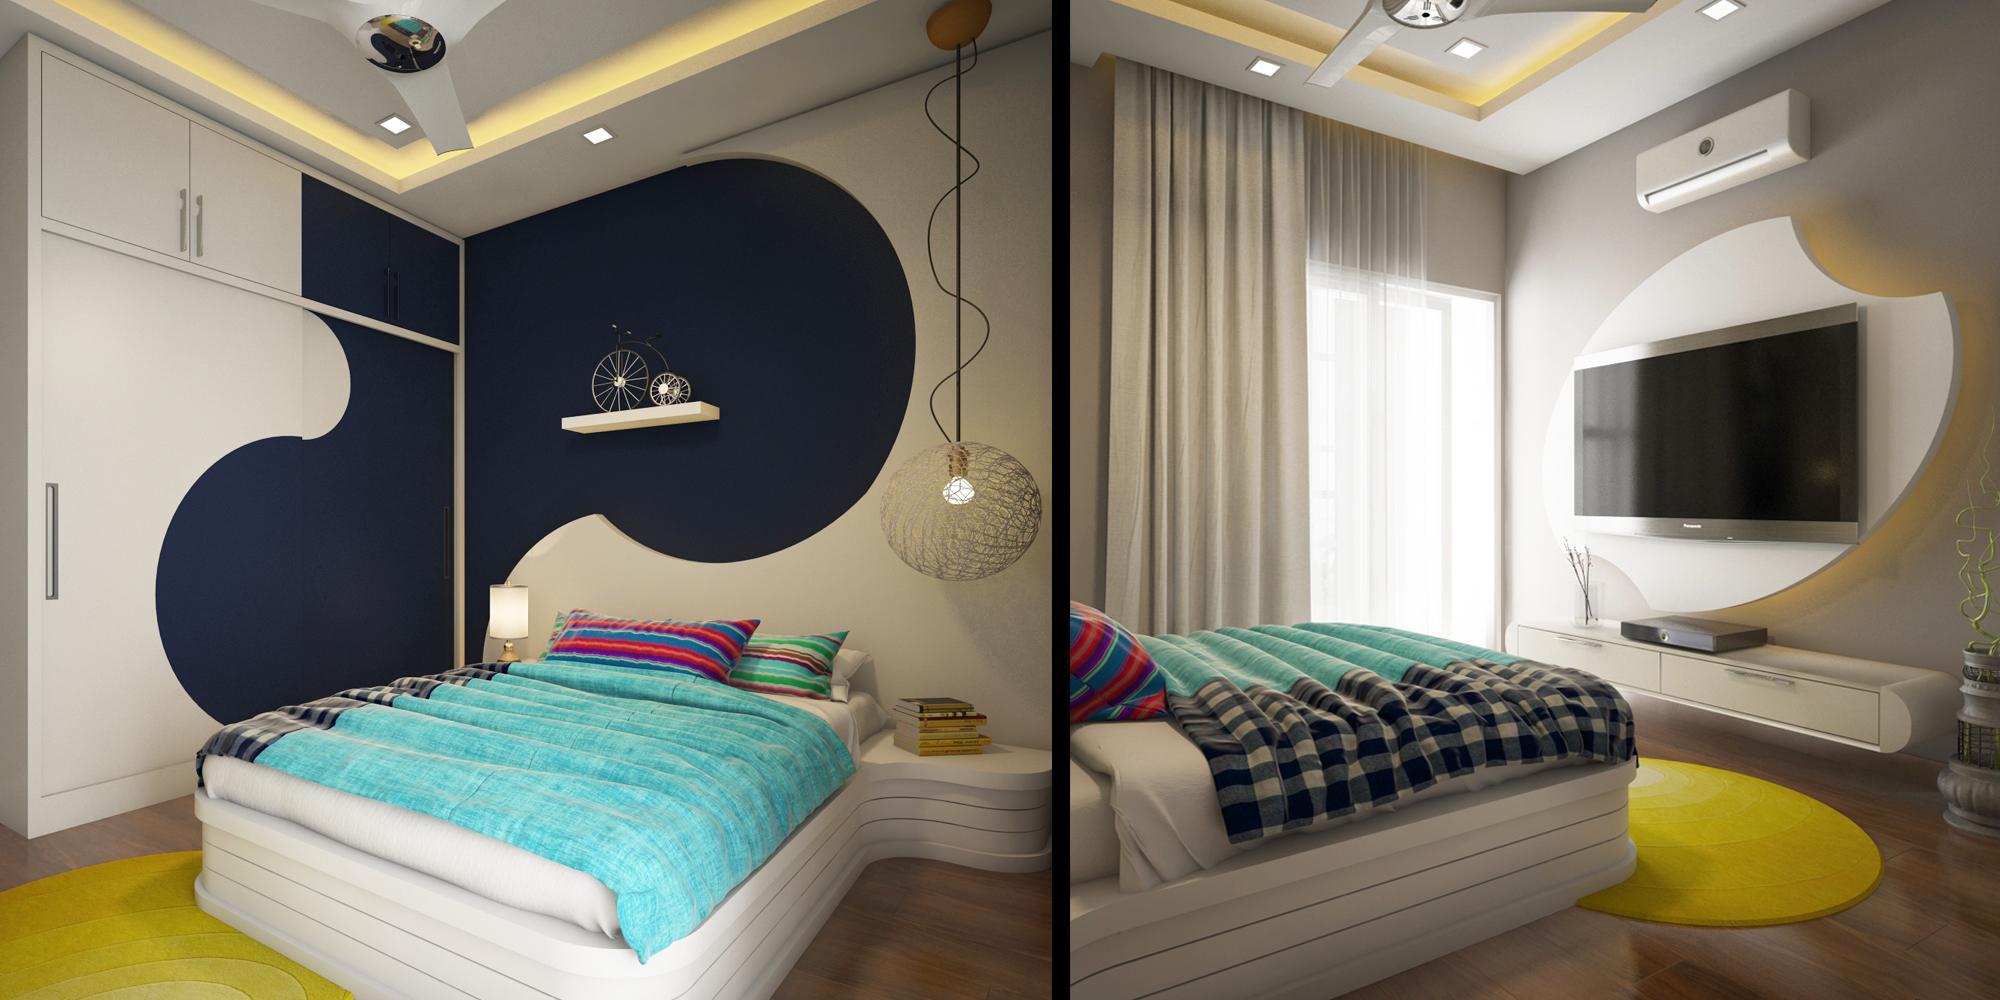 Geomatric Pattern home interior design